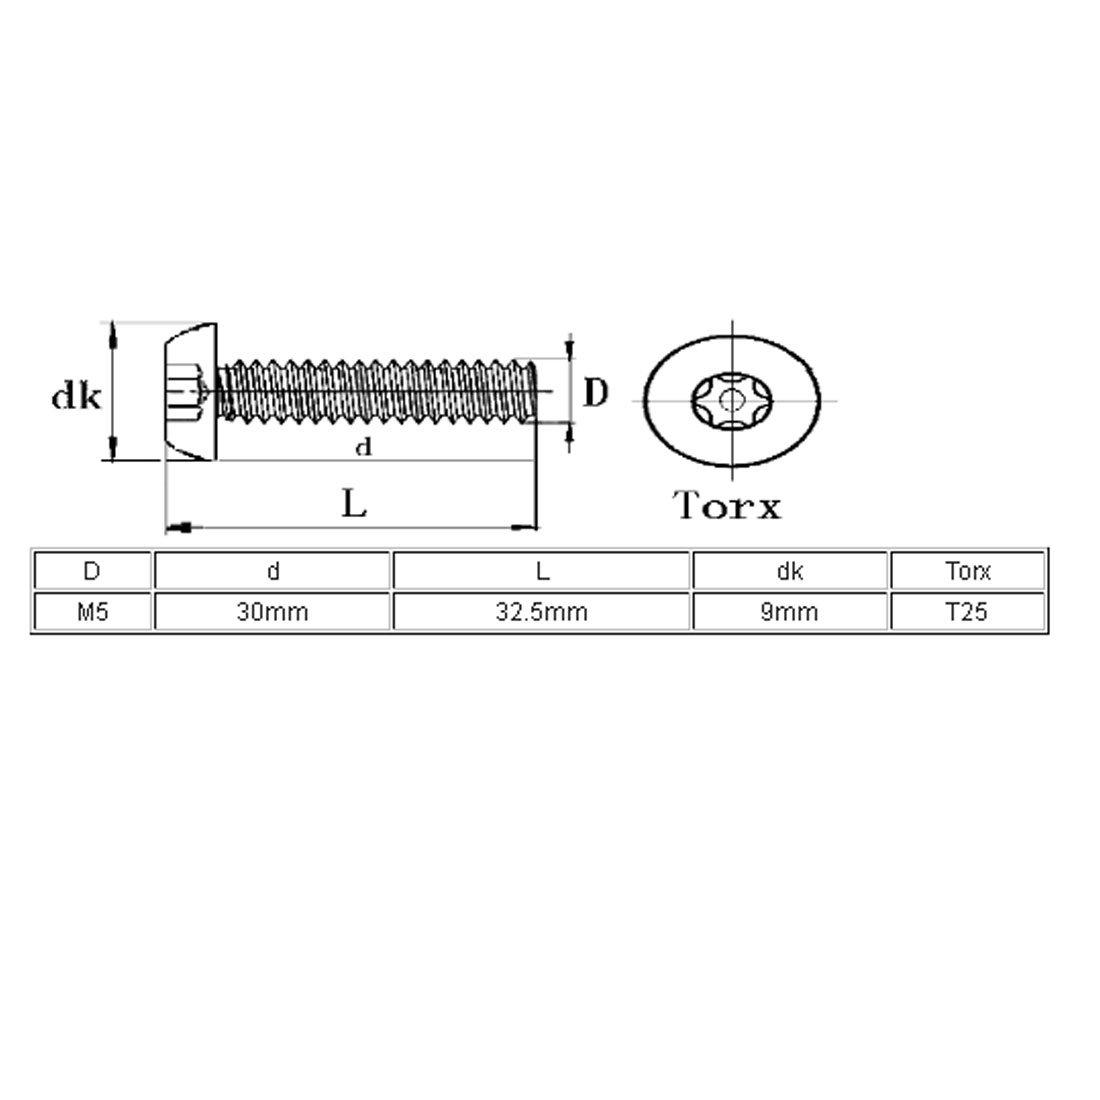 sourcingmap/® M5x30mm 304 Cabeza de bot/ón de acero inoxidable de seguridad Torx tornillos a prueba de manipulaciones 5pcs